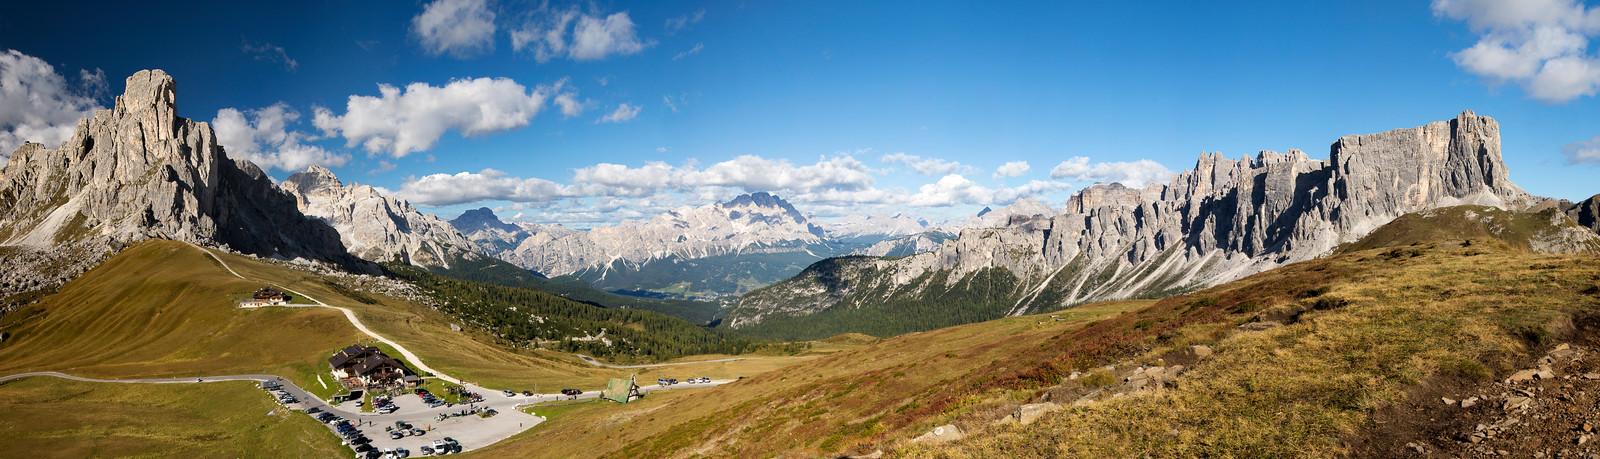 Passo di Giau (11 Photo Stitched Panorama)